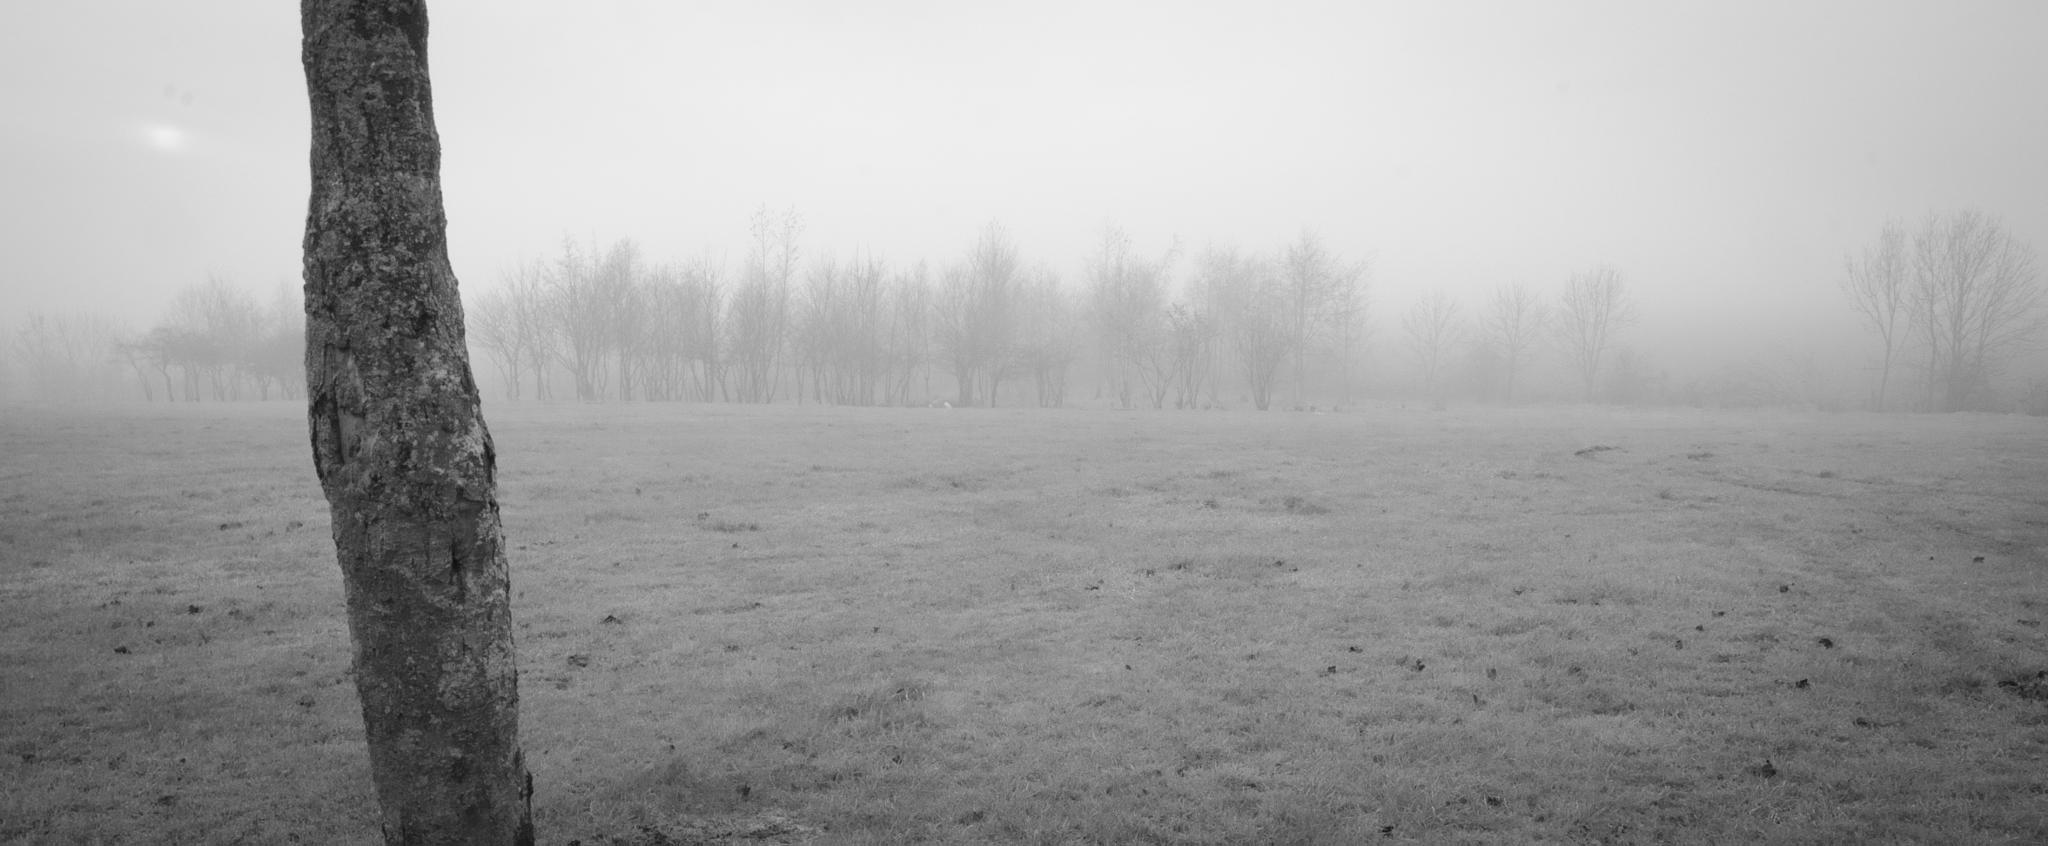 Hartlepool Mist3 by GreenLady121